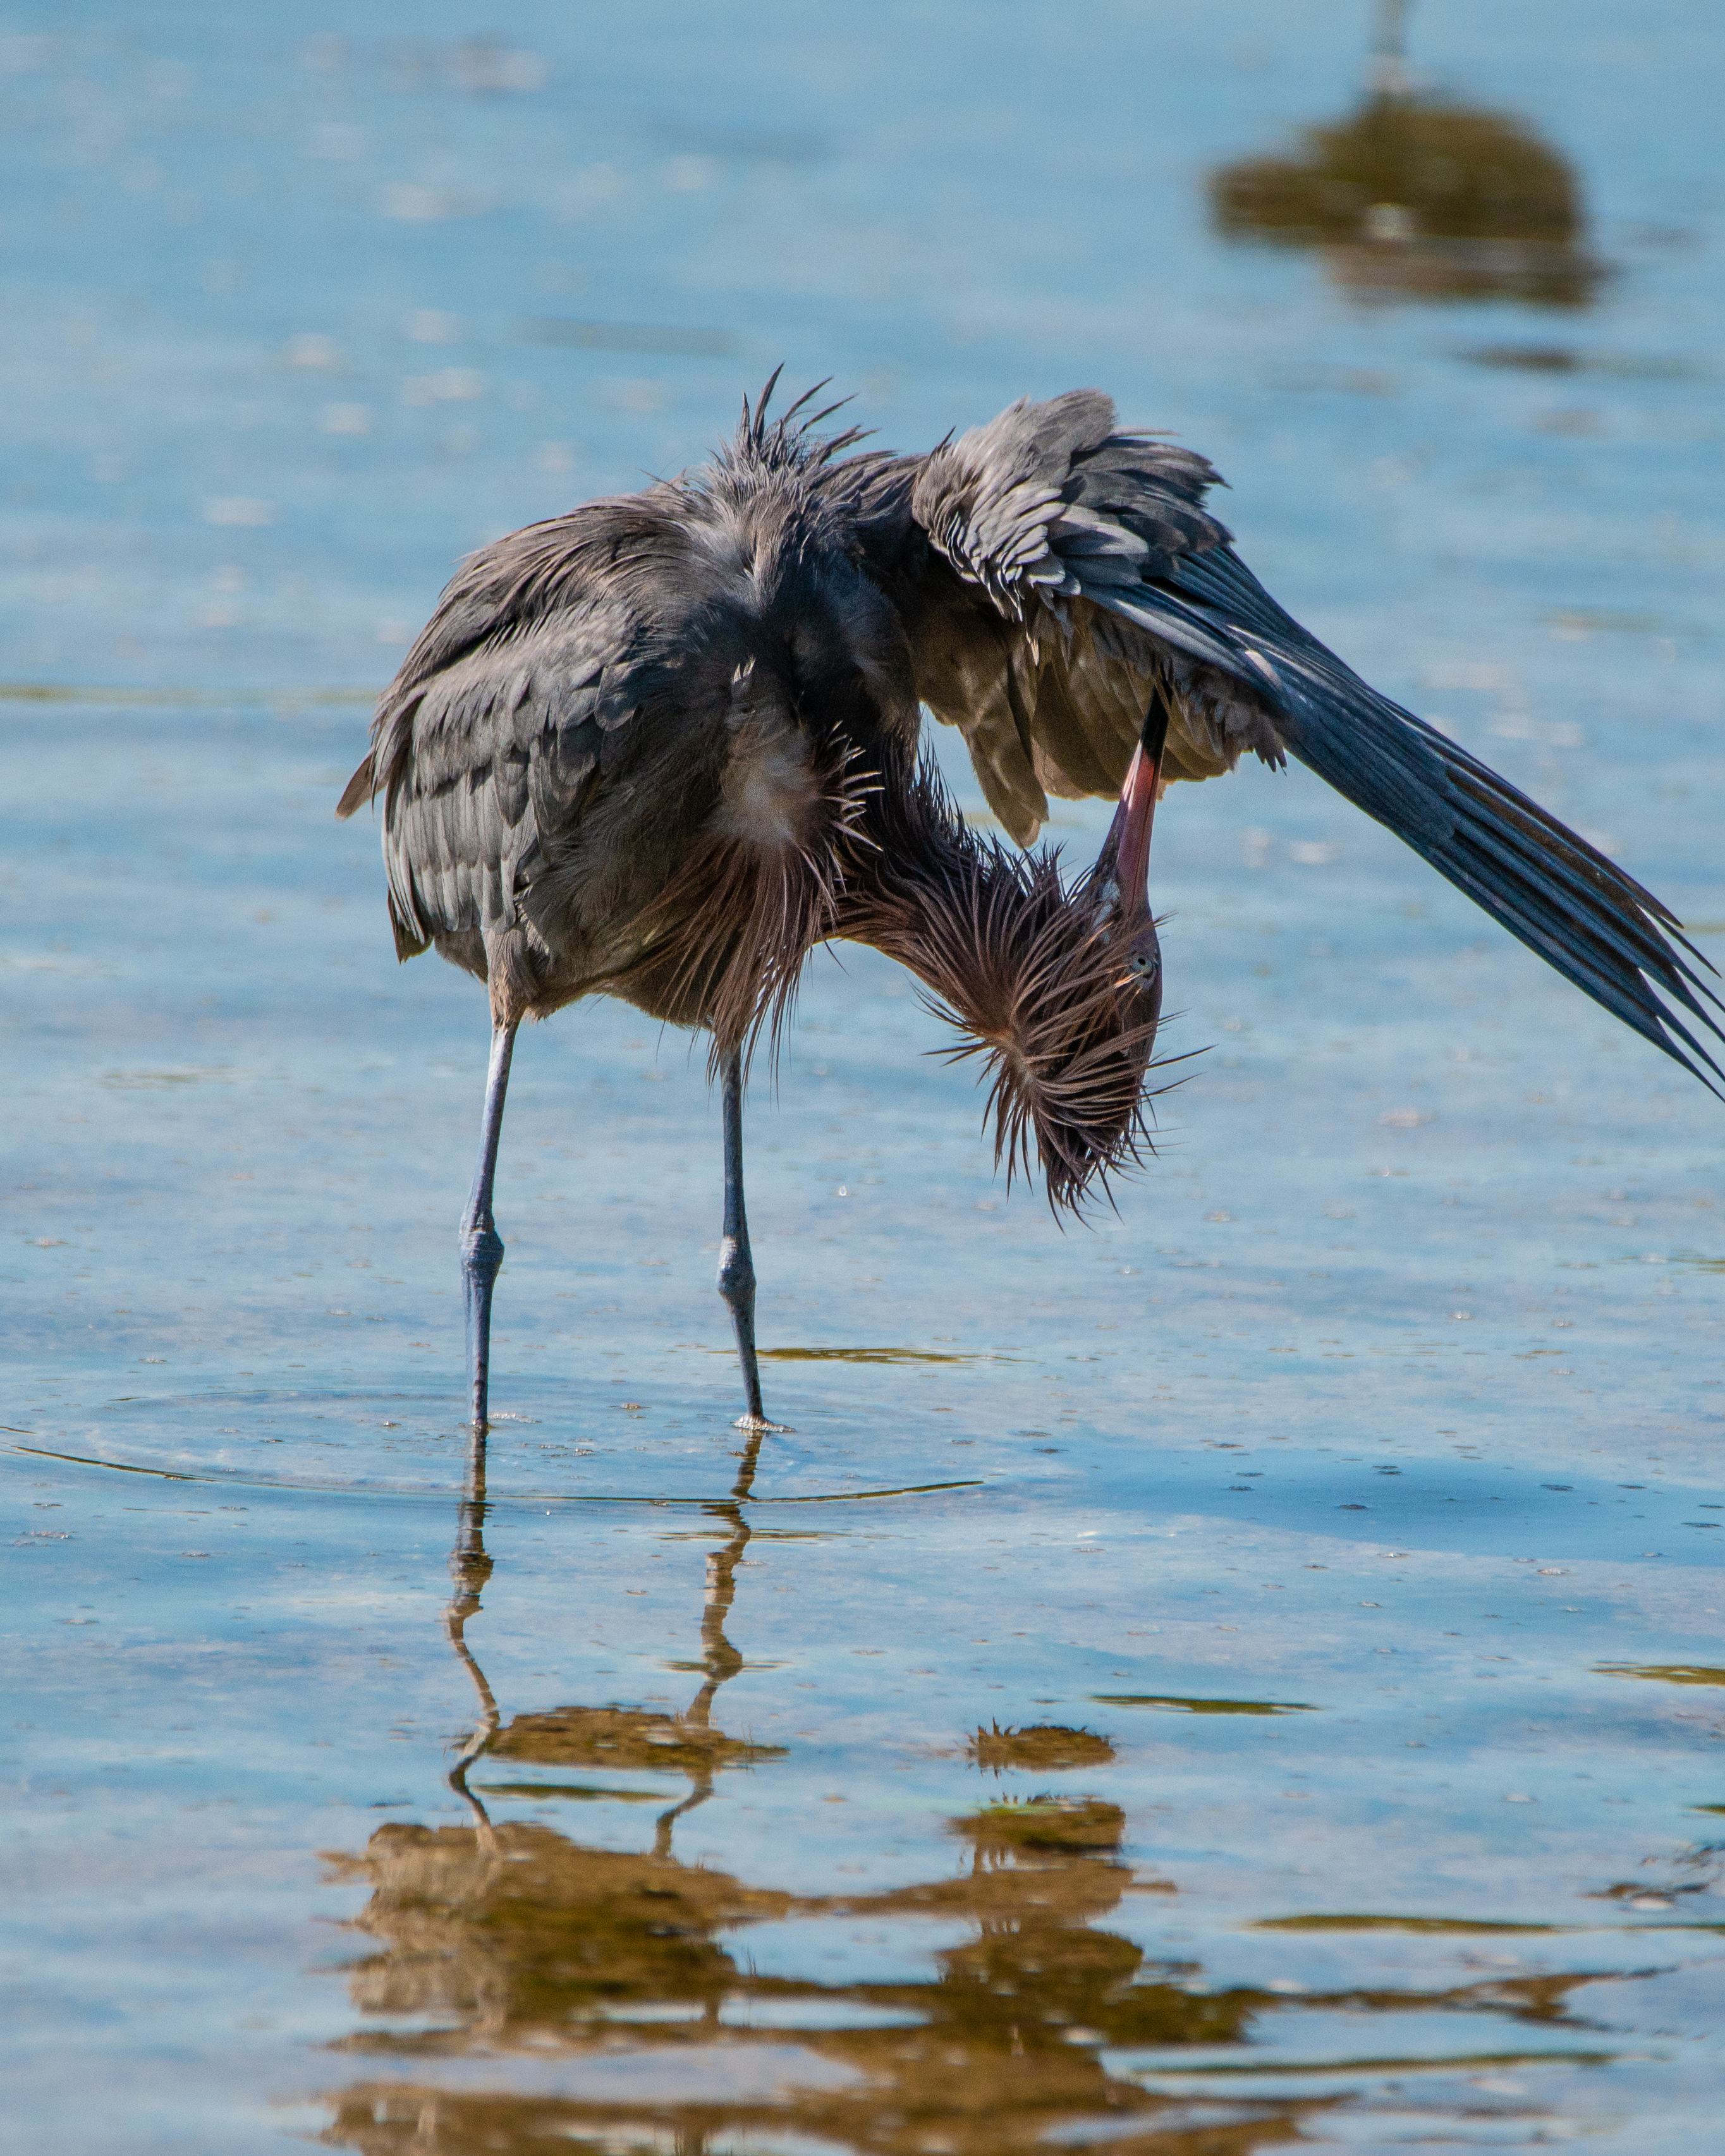 #reddishegret, #heron, #preening, #birdphotography, #naturephotography, #wildlifephotography, #nikon, #dingdarling, #sanibel, #florida, #birds, #feathers